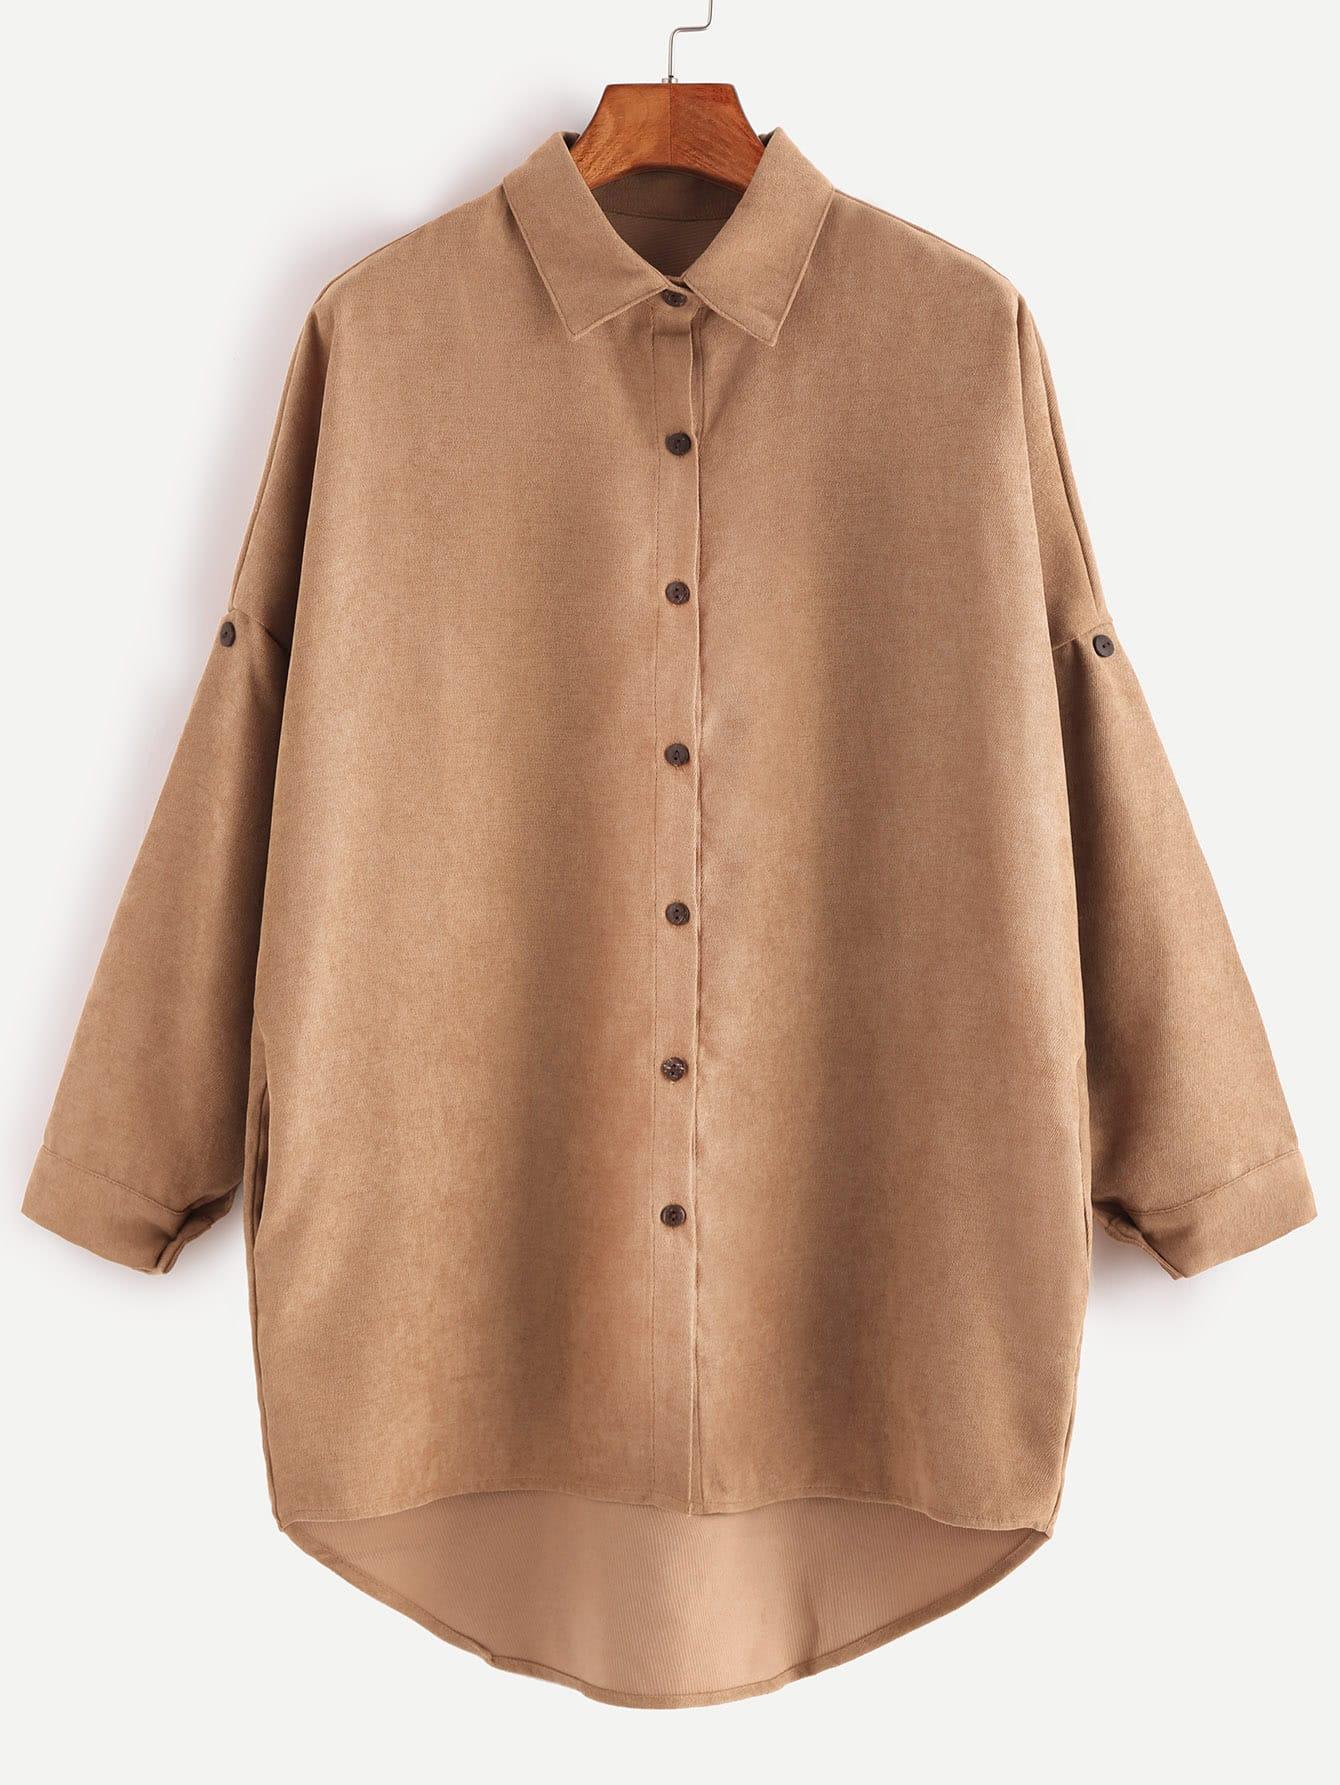 blouse161212003_2